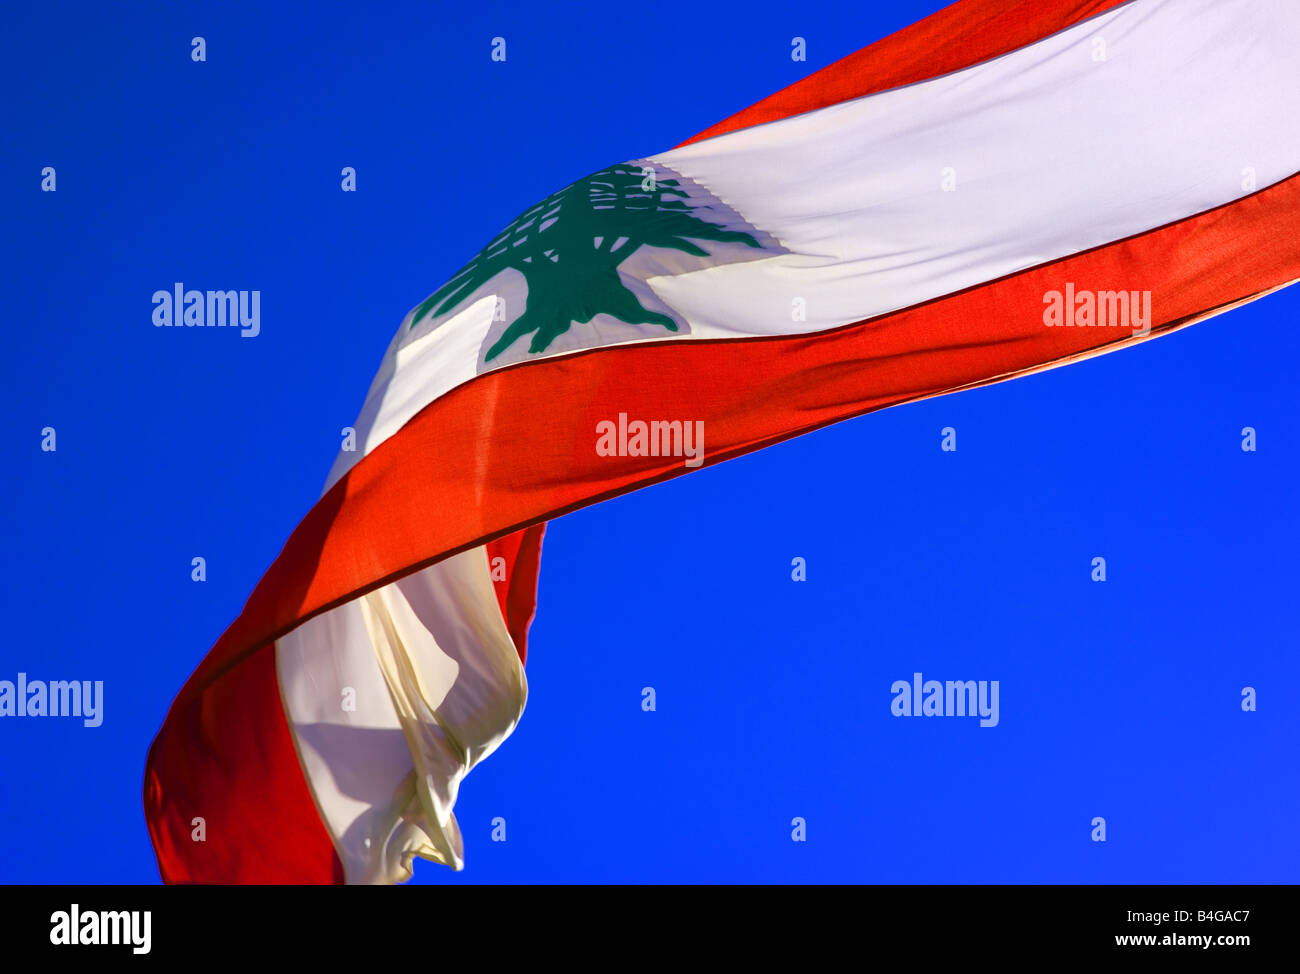 Lebanon's flag in the wind. - Stock Image